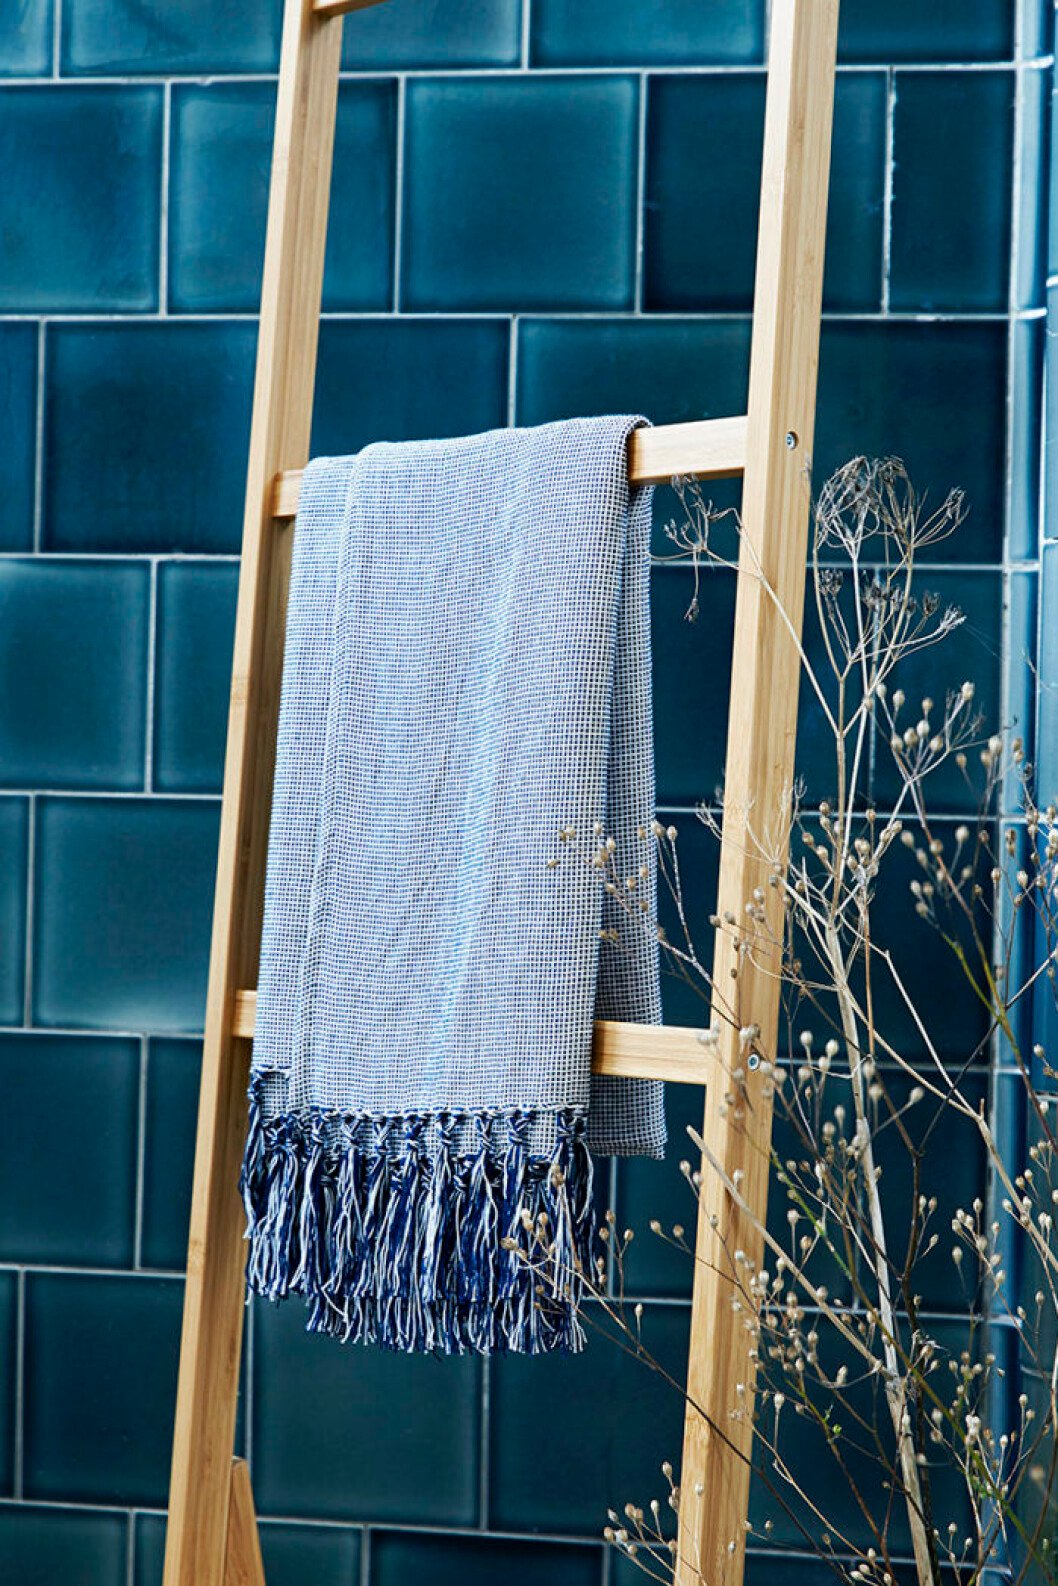 Ikeas kollektion Innehållsrik, stege med handduk.